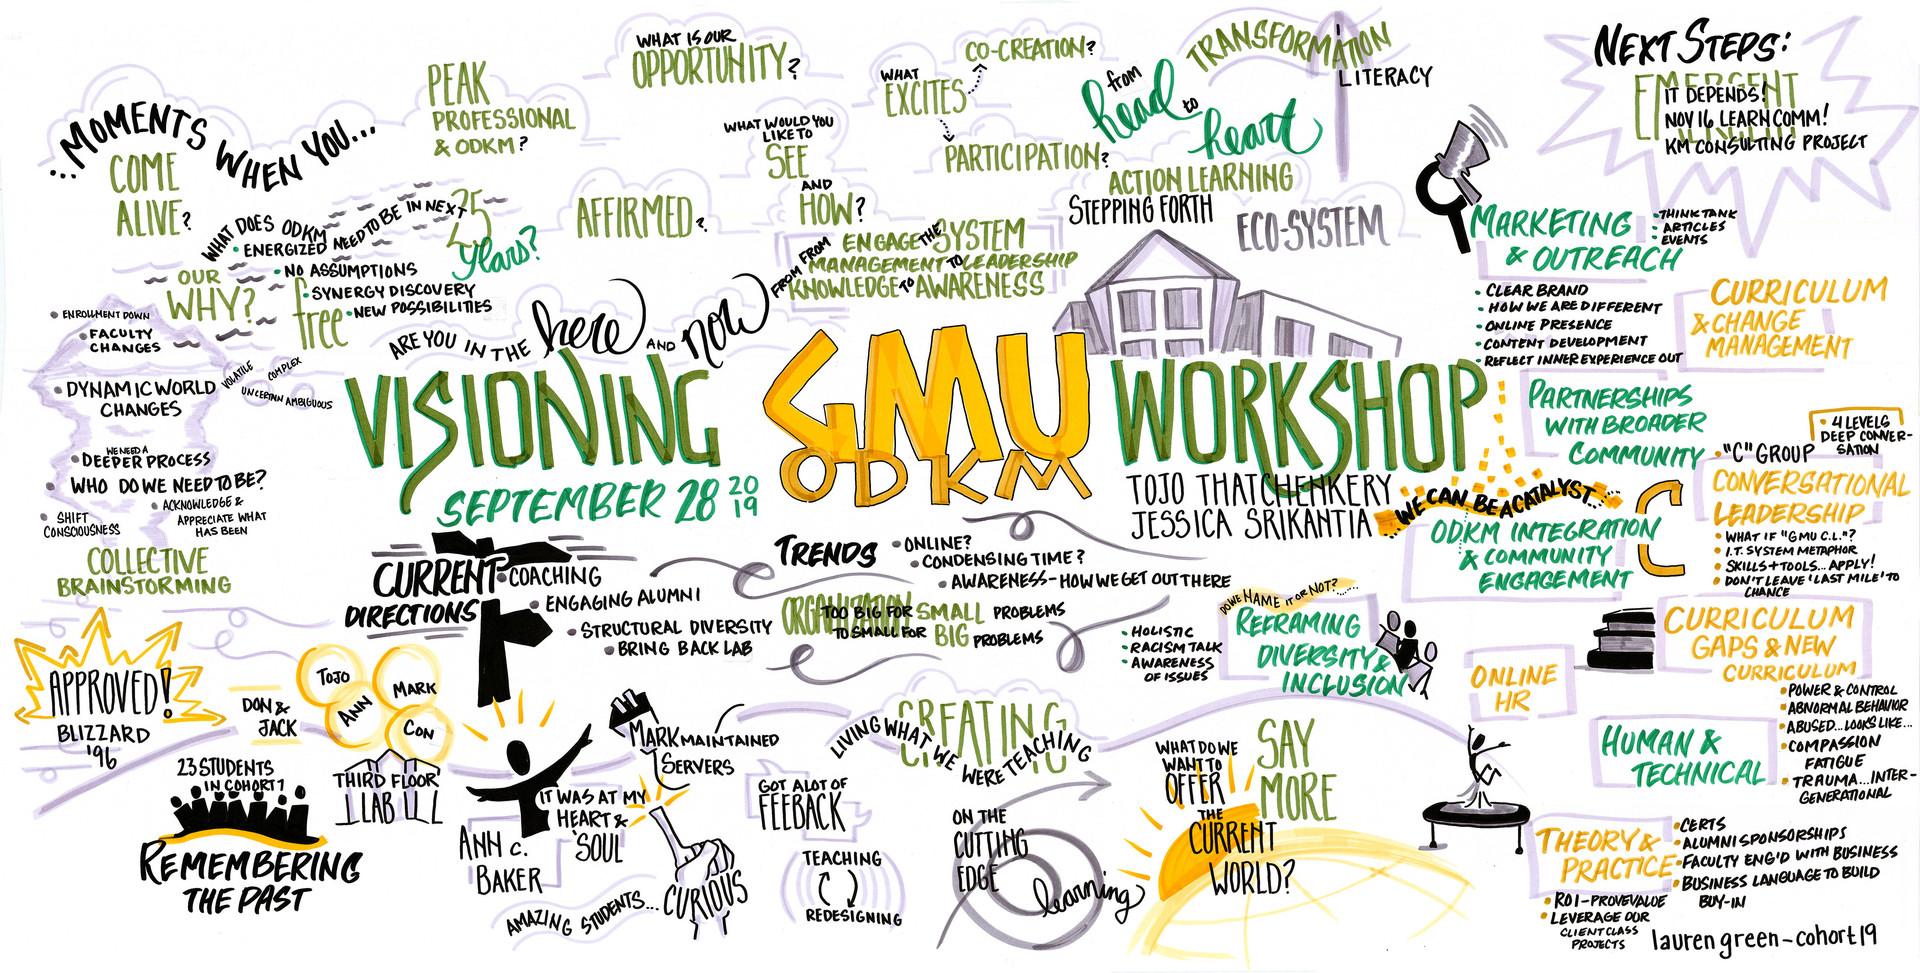 George Mason University ODKM Visioning Workshop